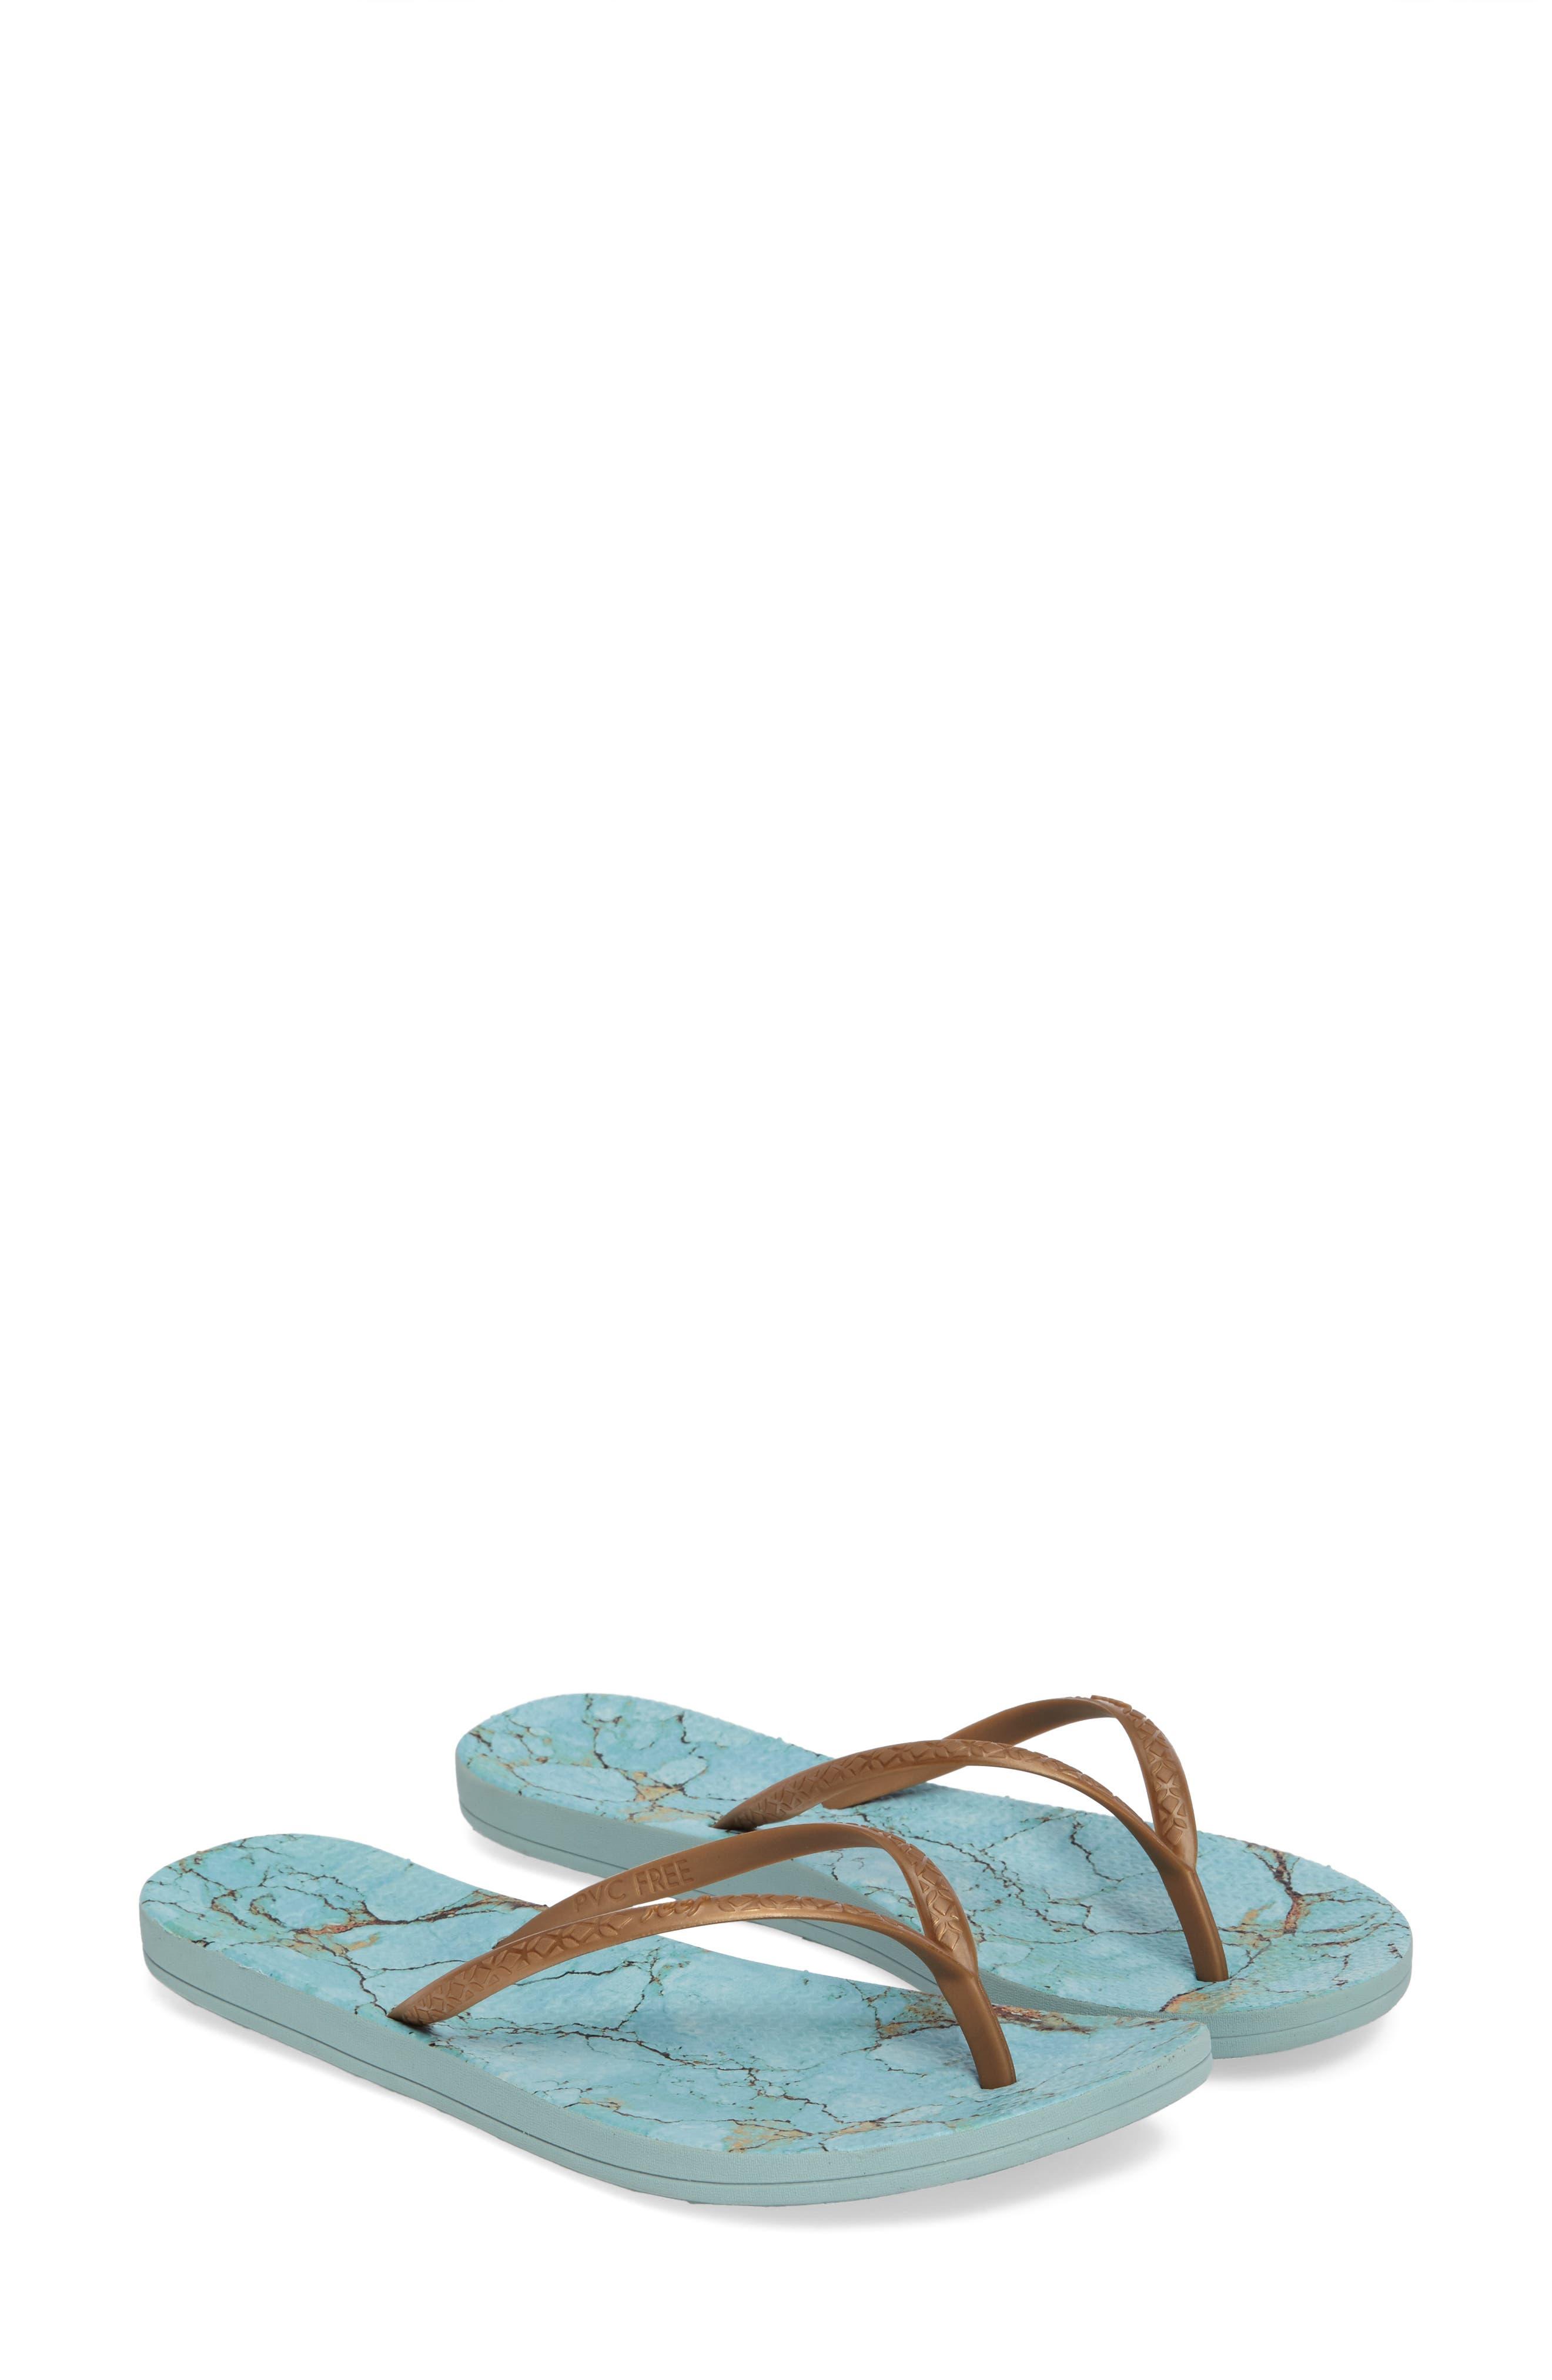 Alternate Image 1 Selected - Reef Escape Flip Flop (Women)